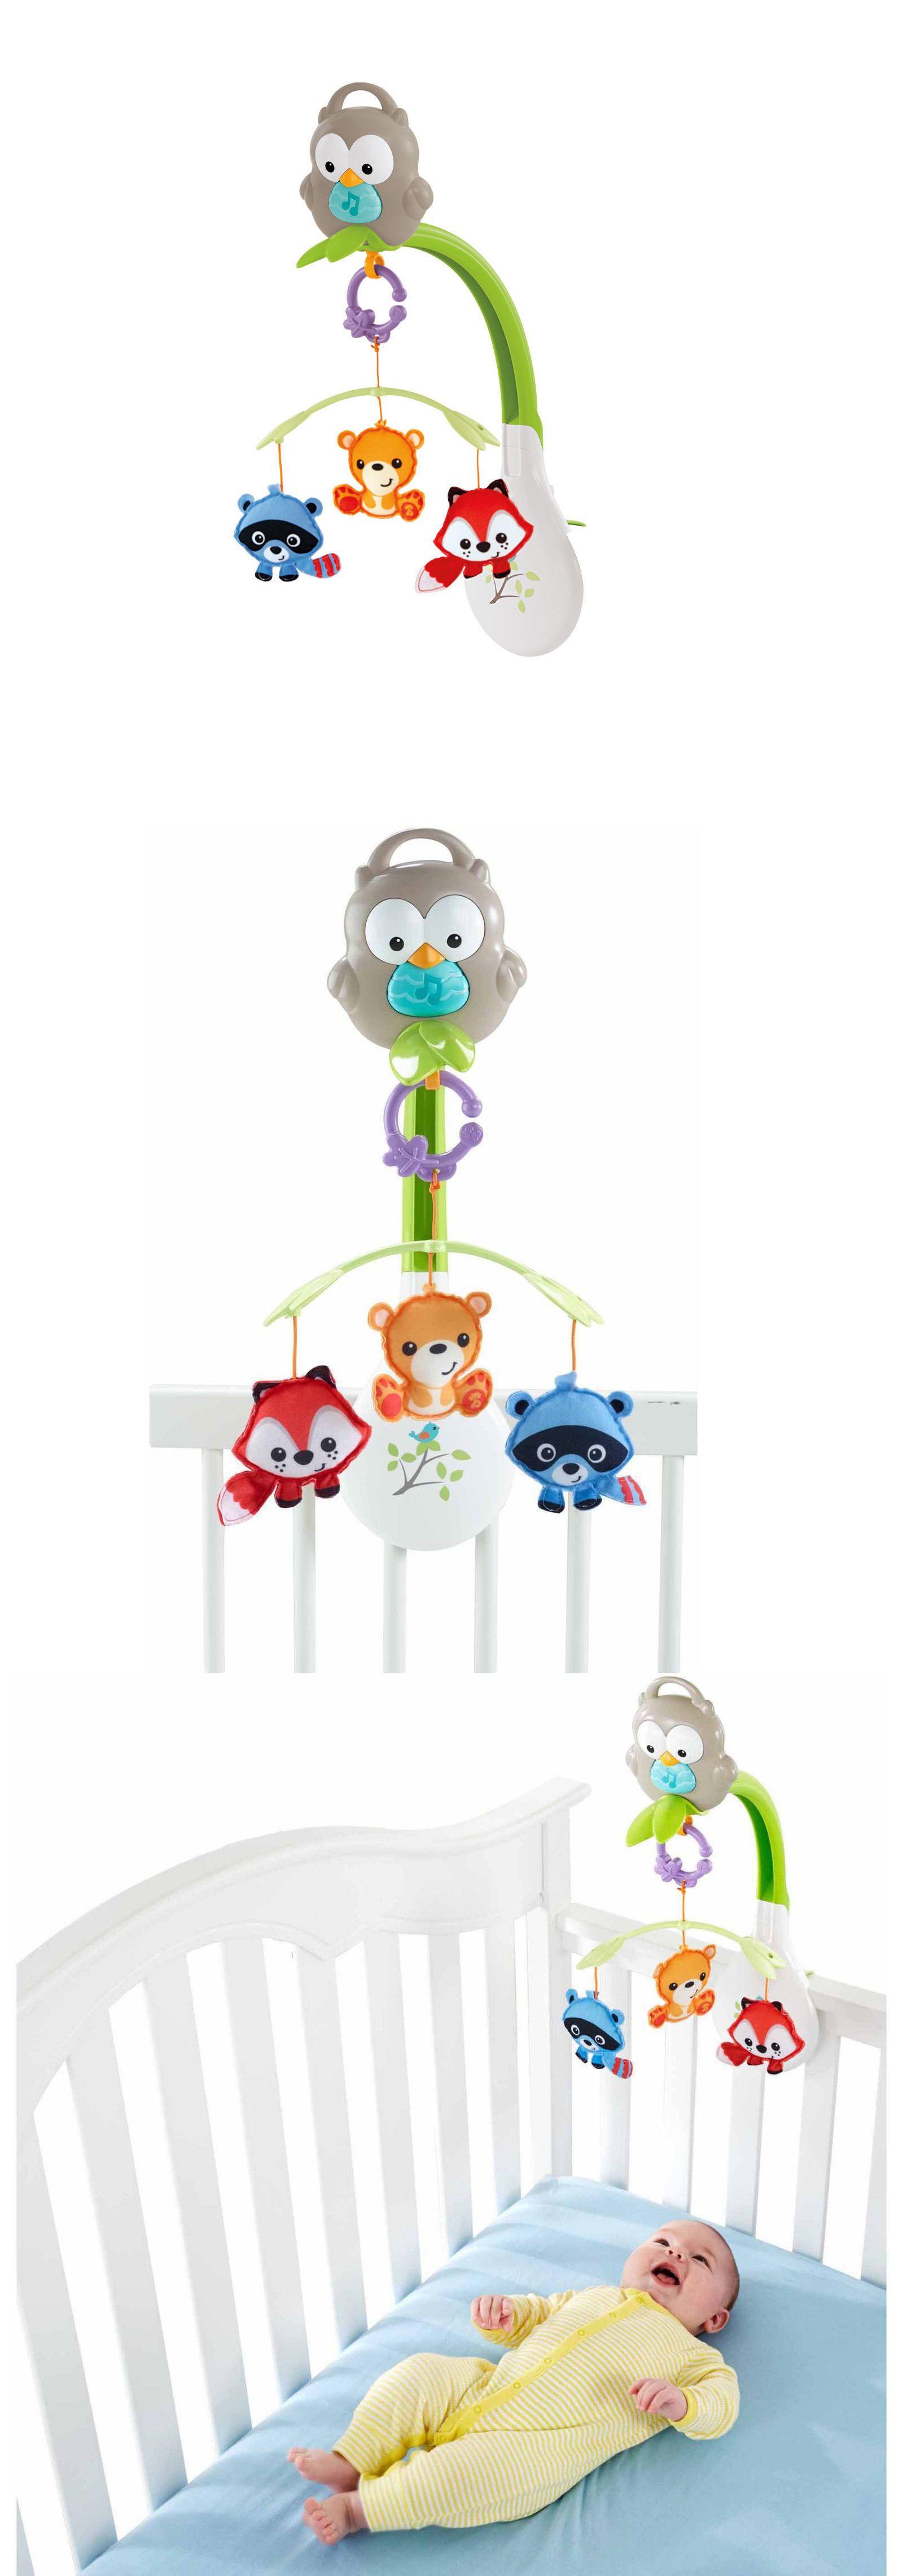 Crib Toys Fisher Price 3 In 1 Musical Mobile Motorized Crib